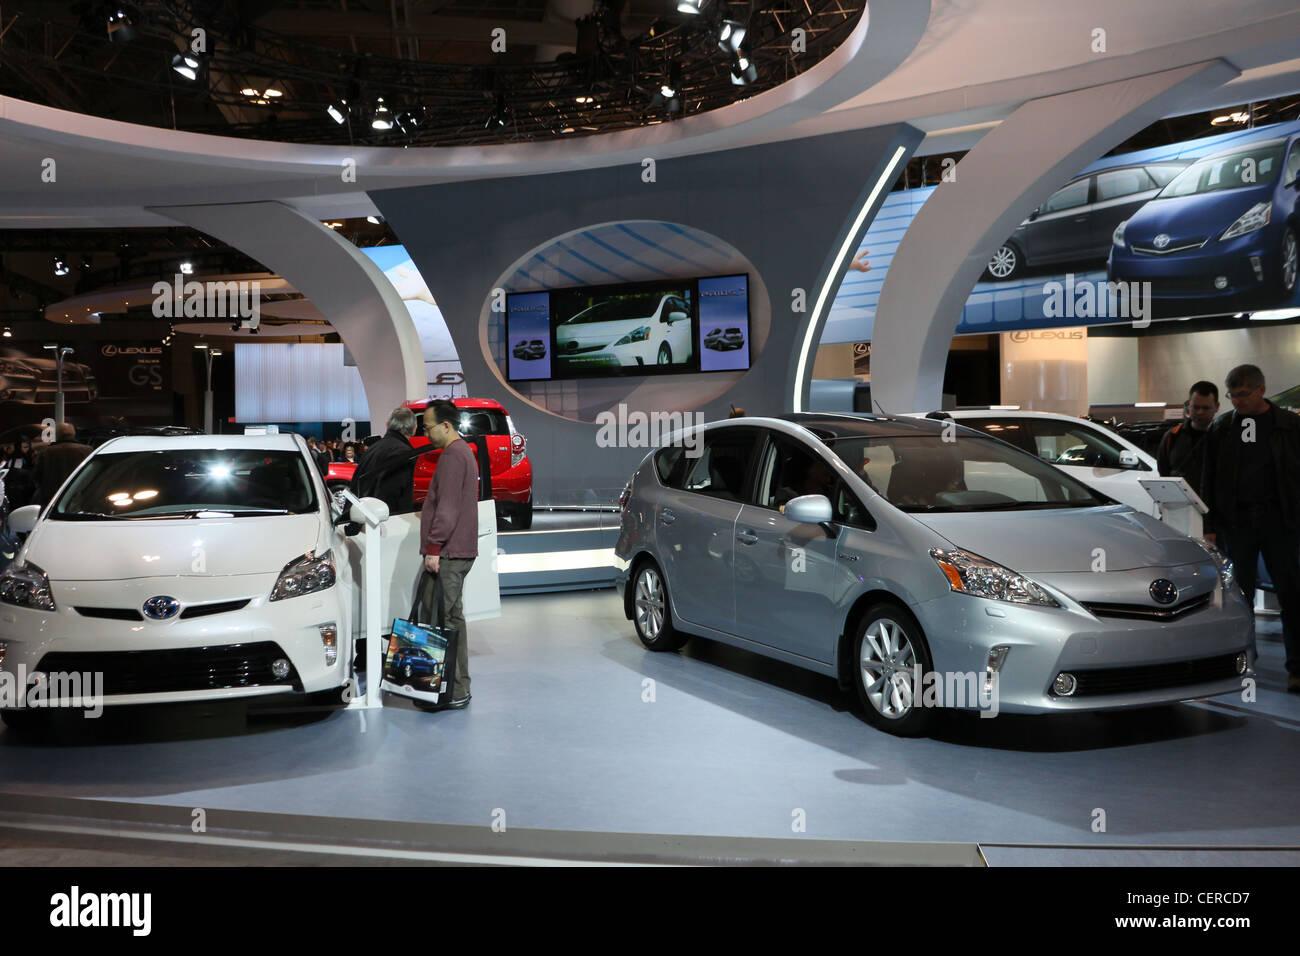 Toyota Prius ibrida elettrico auto automobili showroom Immagini Stock